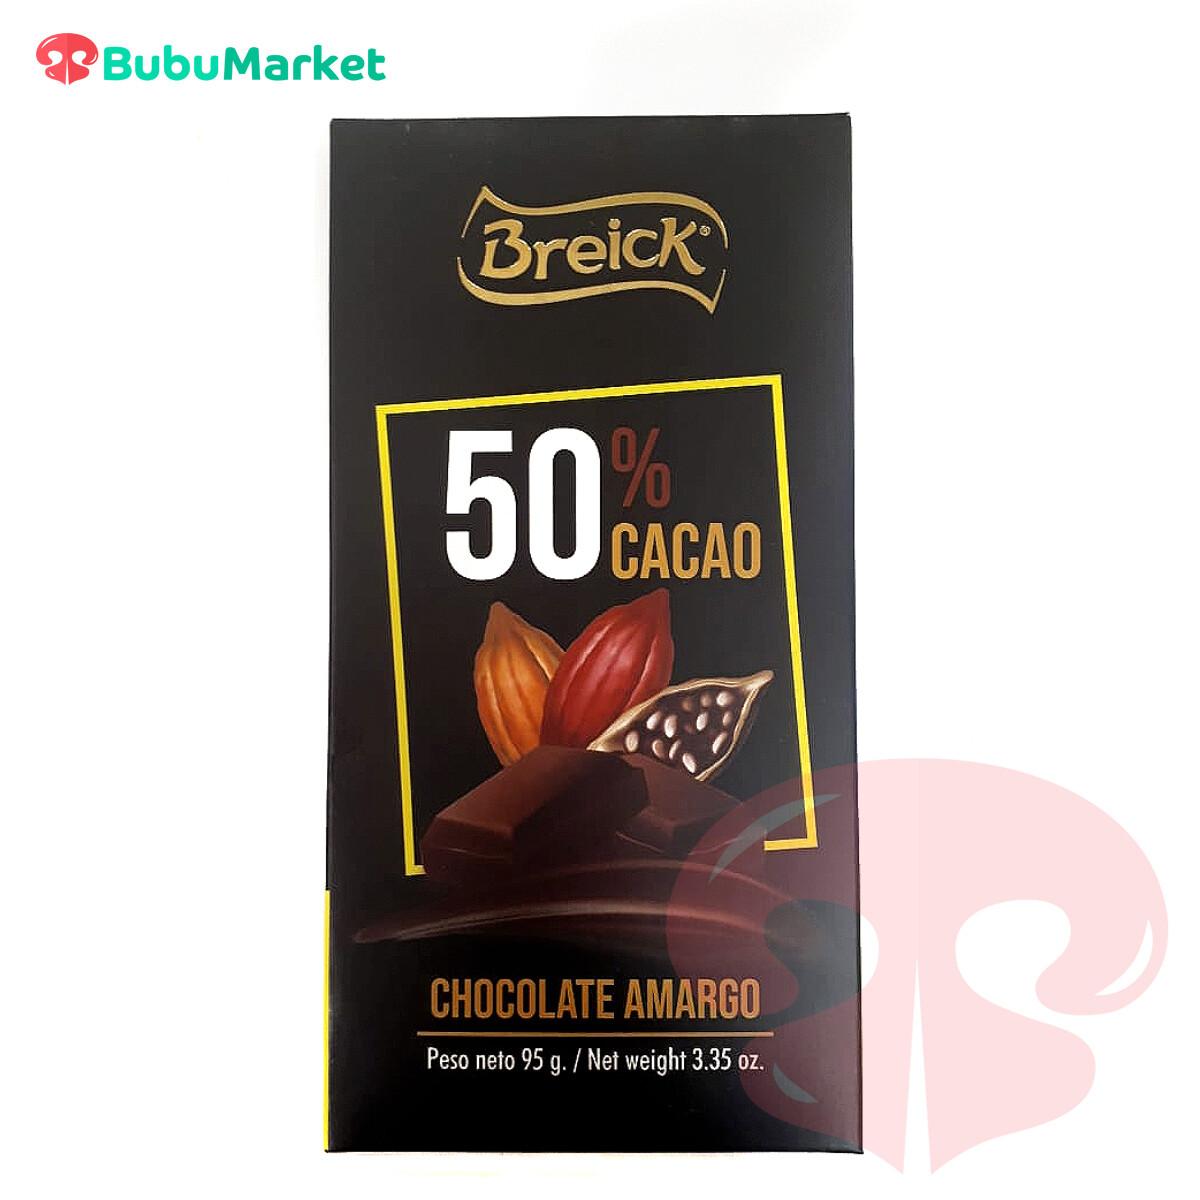 CHOCOLATE AMARGO 50% CACAO BREICK TABLETA 95 GR.